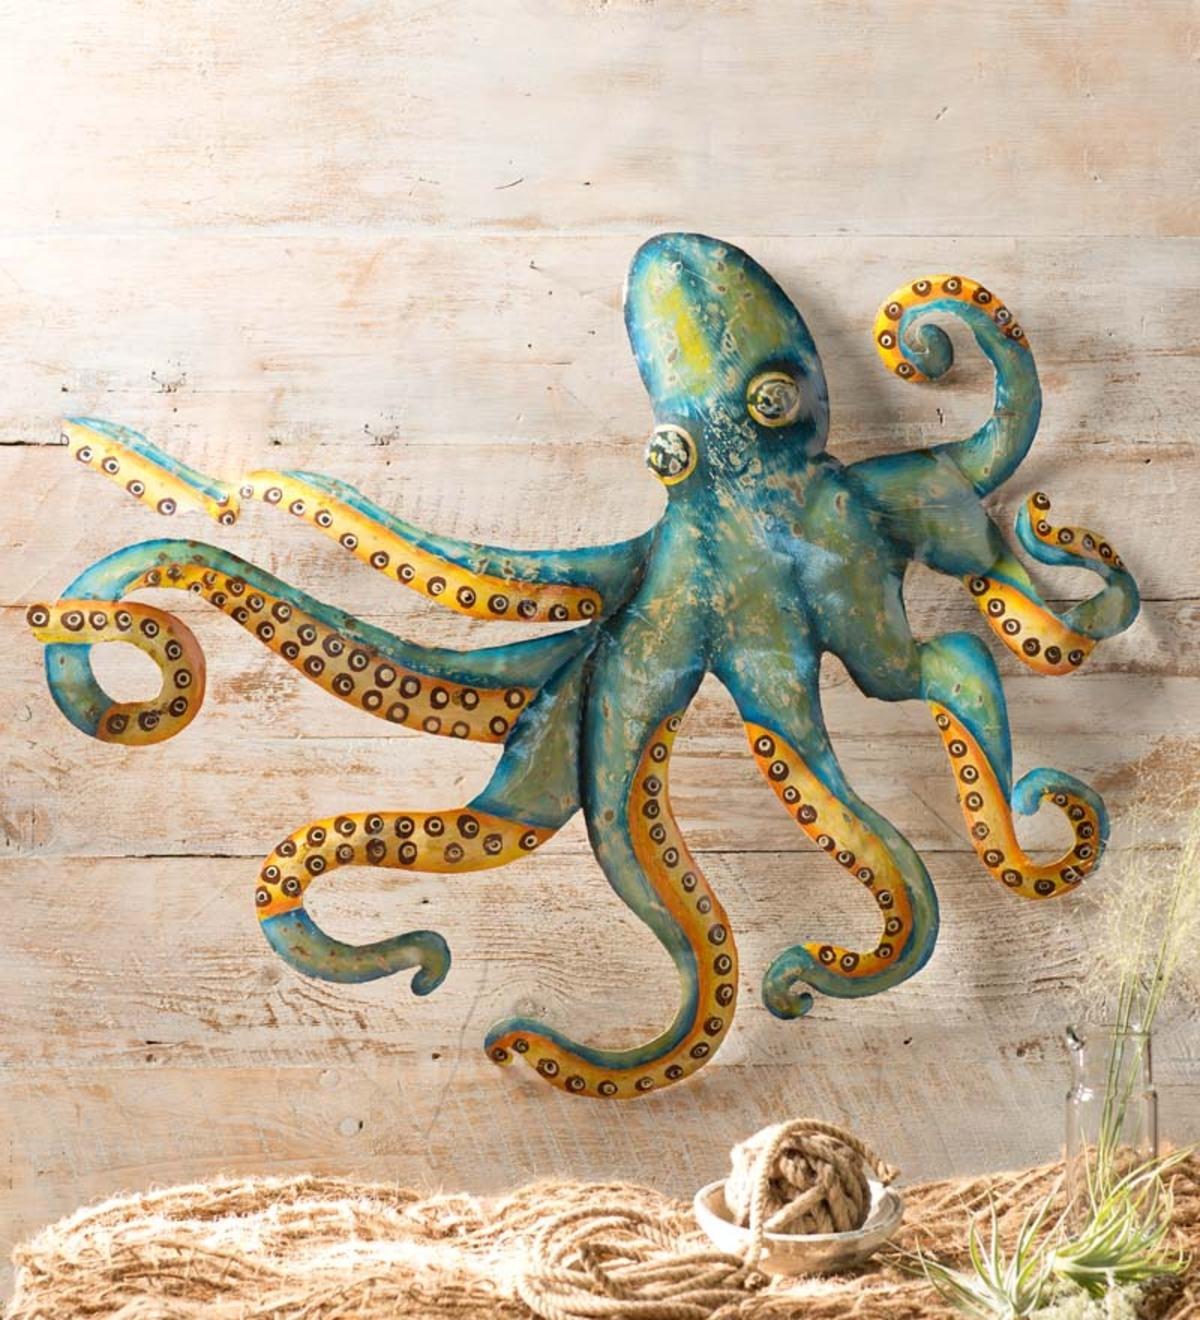 Handcrafted Metal Octopus Wall Art | Seaside Home Decor | New & Best inside Octopus Wall Art (Image 7 of 20)